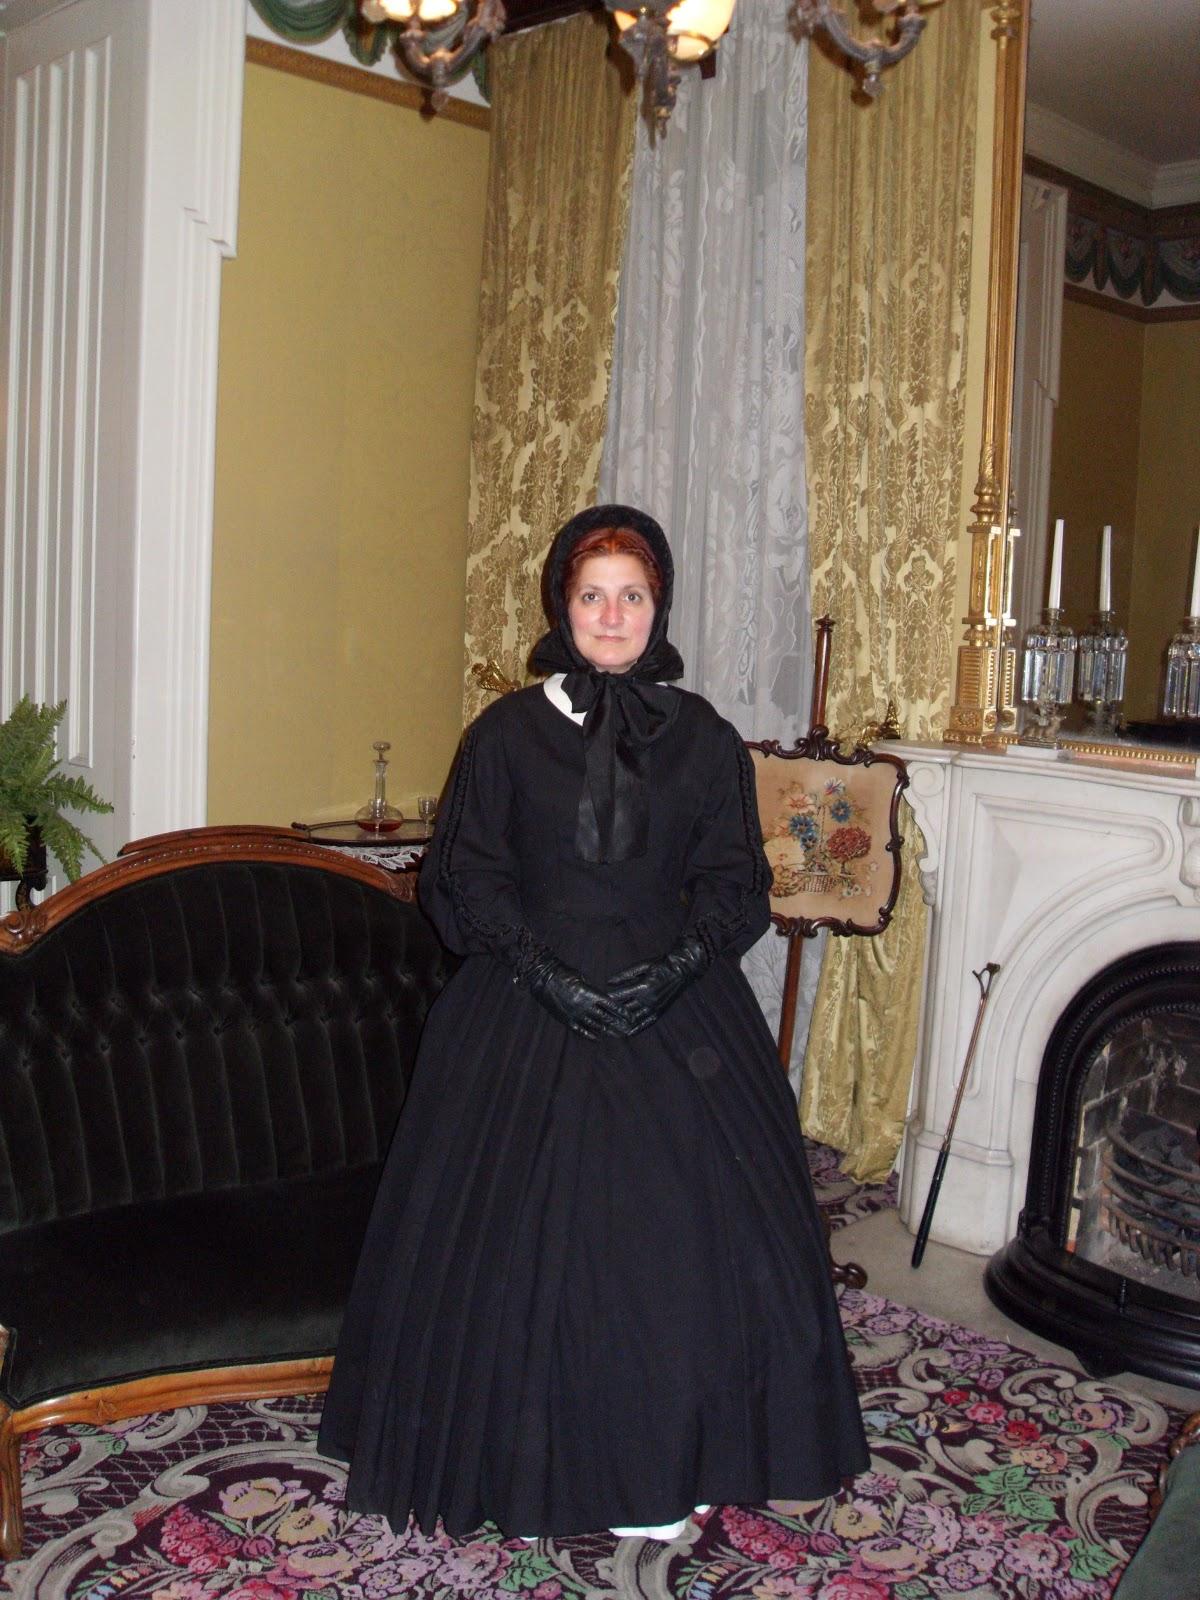 2012 halloween events in columbus   haunted history of columbus, ohio